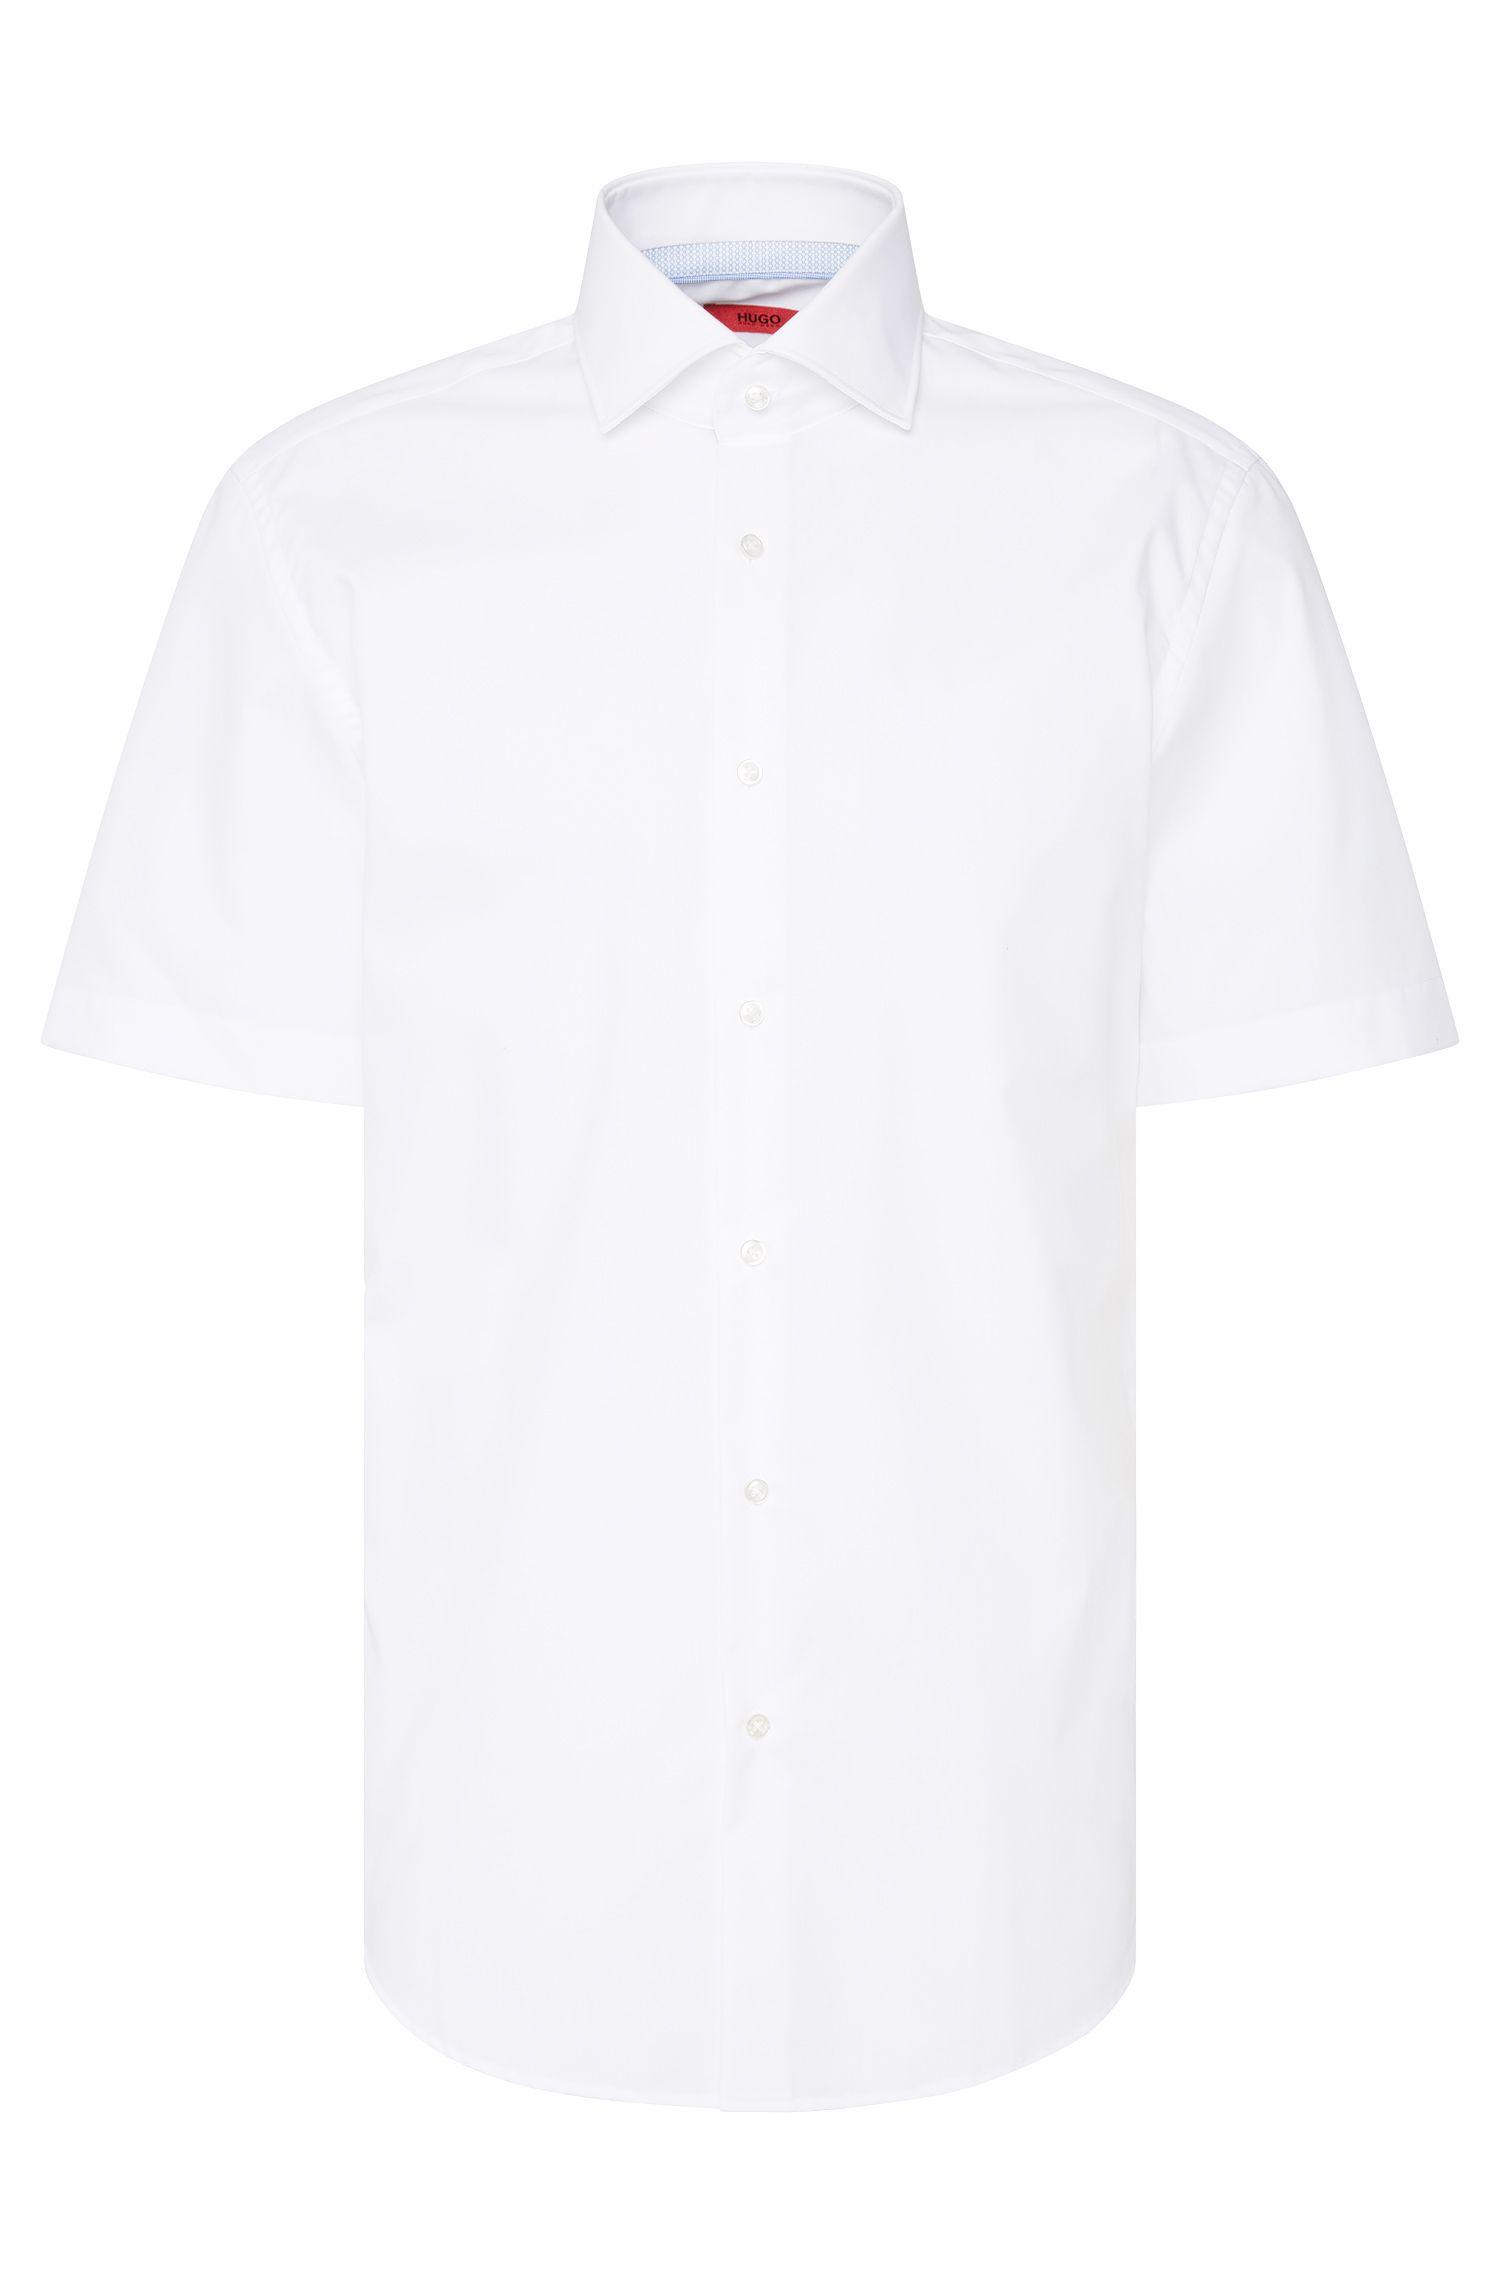 Regular-fit short-sleeved shirt in cotton: 'C-Eraldino'